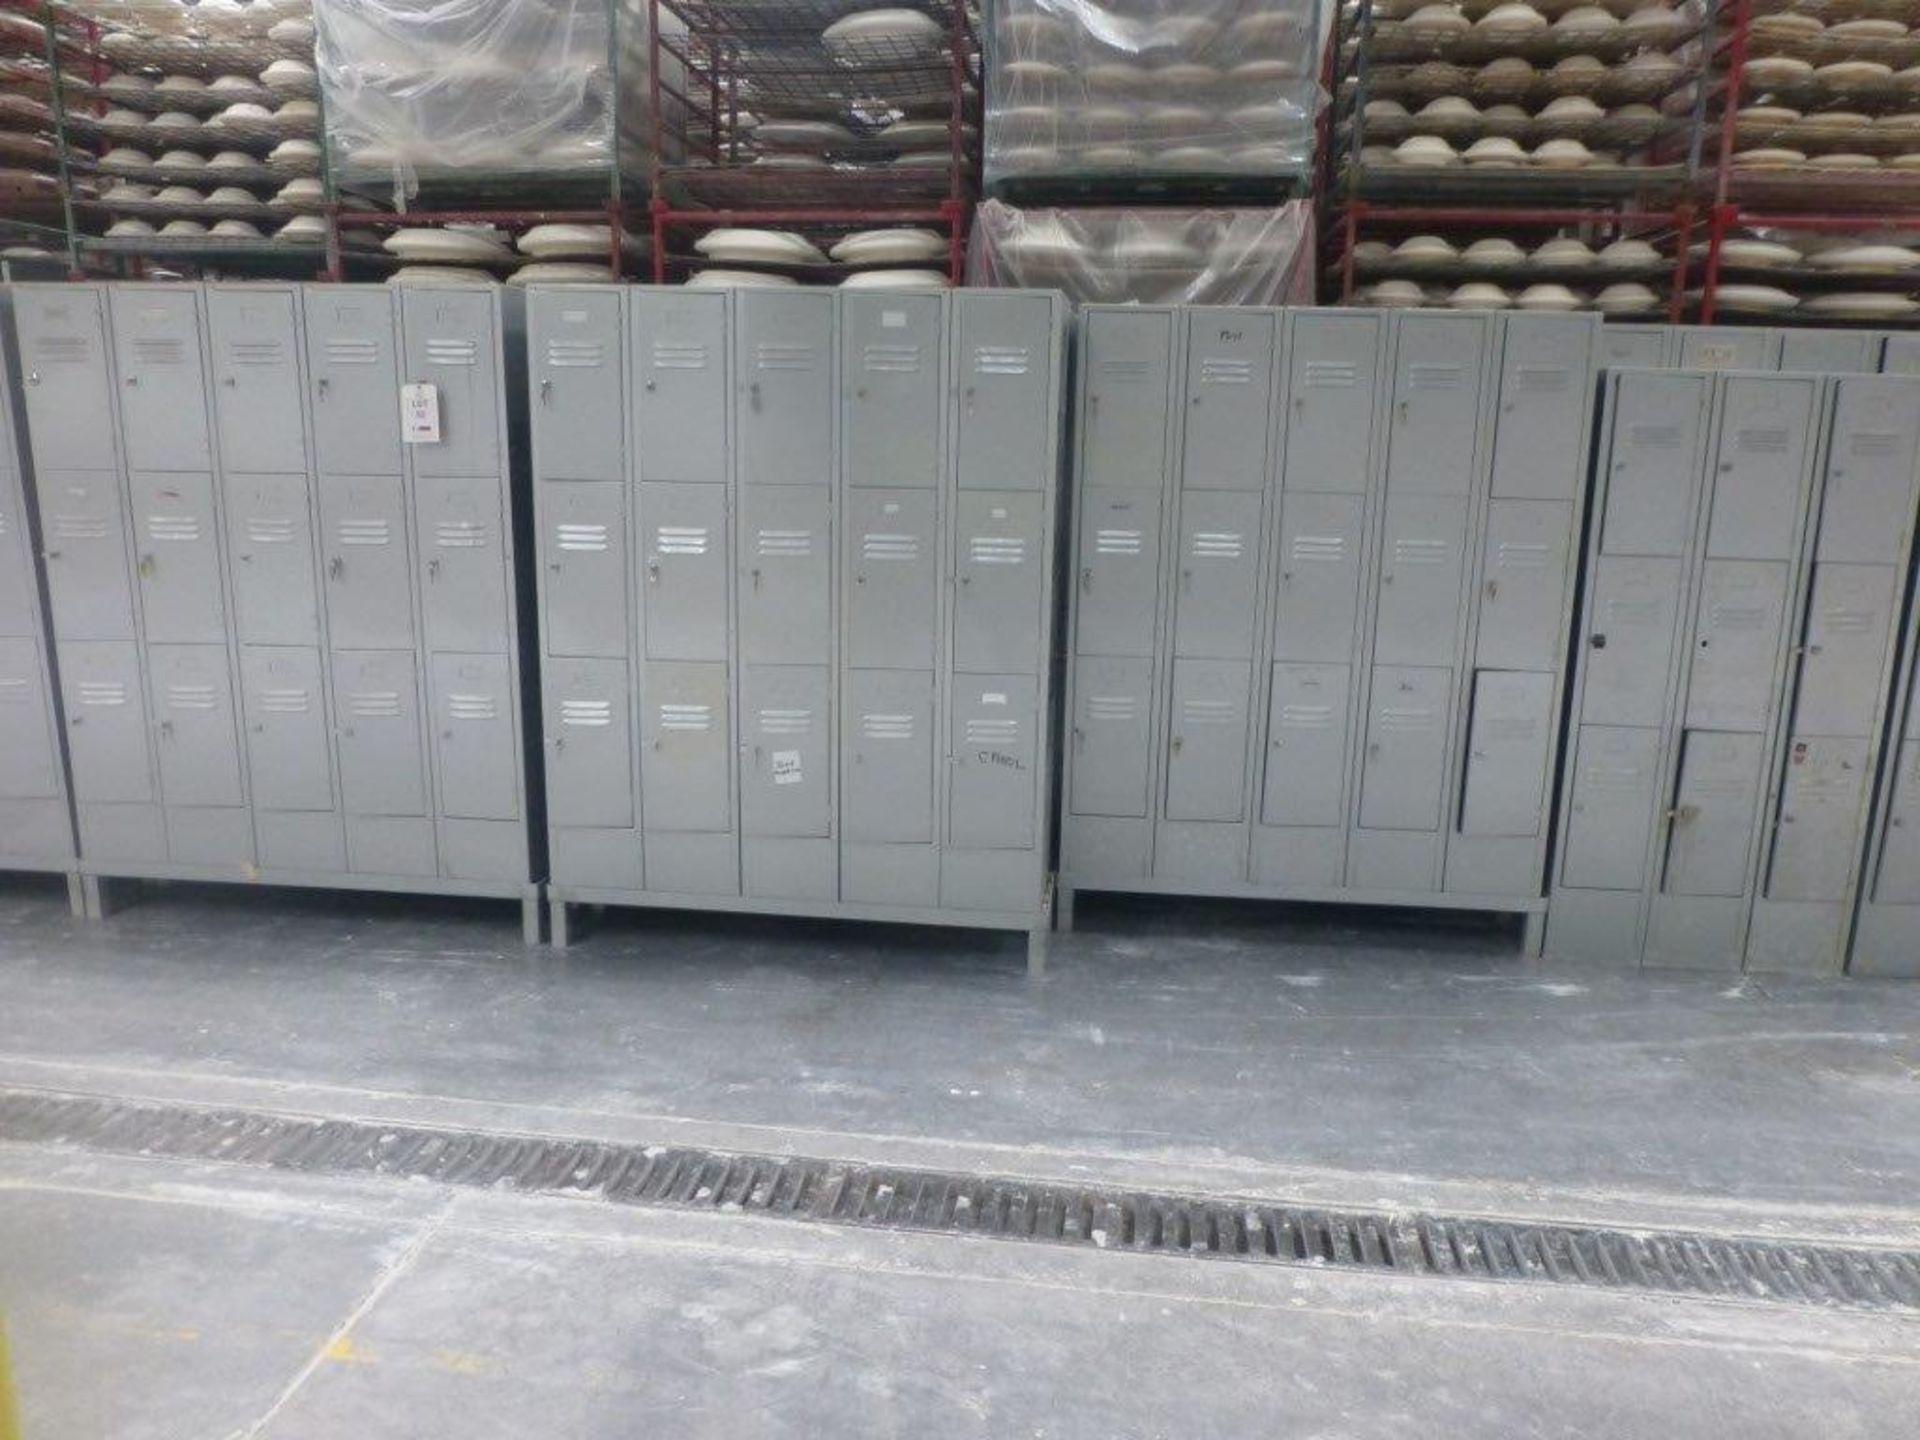 Lot 52 - 50 three compartment steel personnel locker units